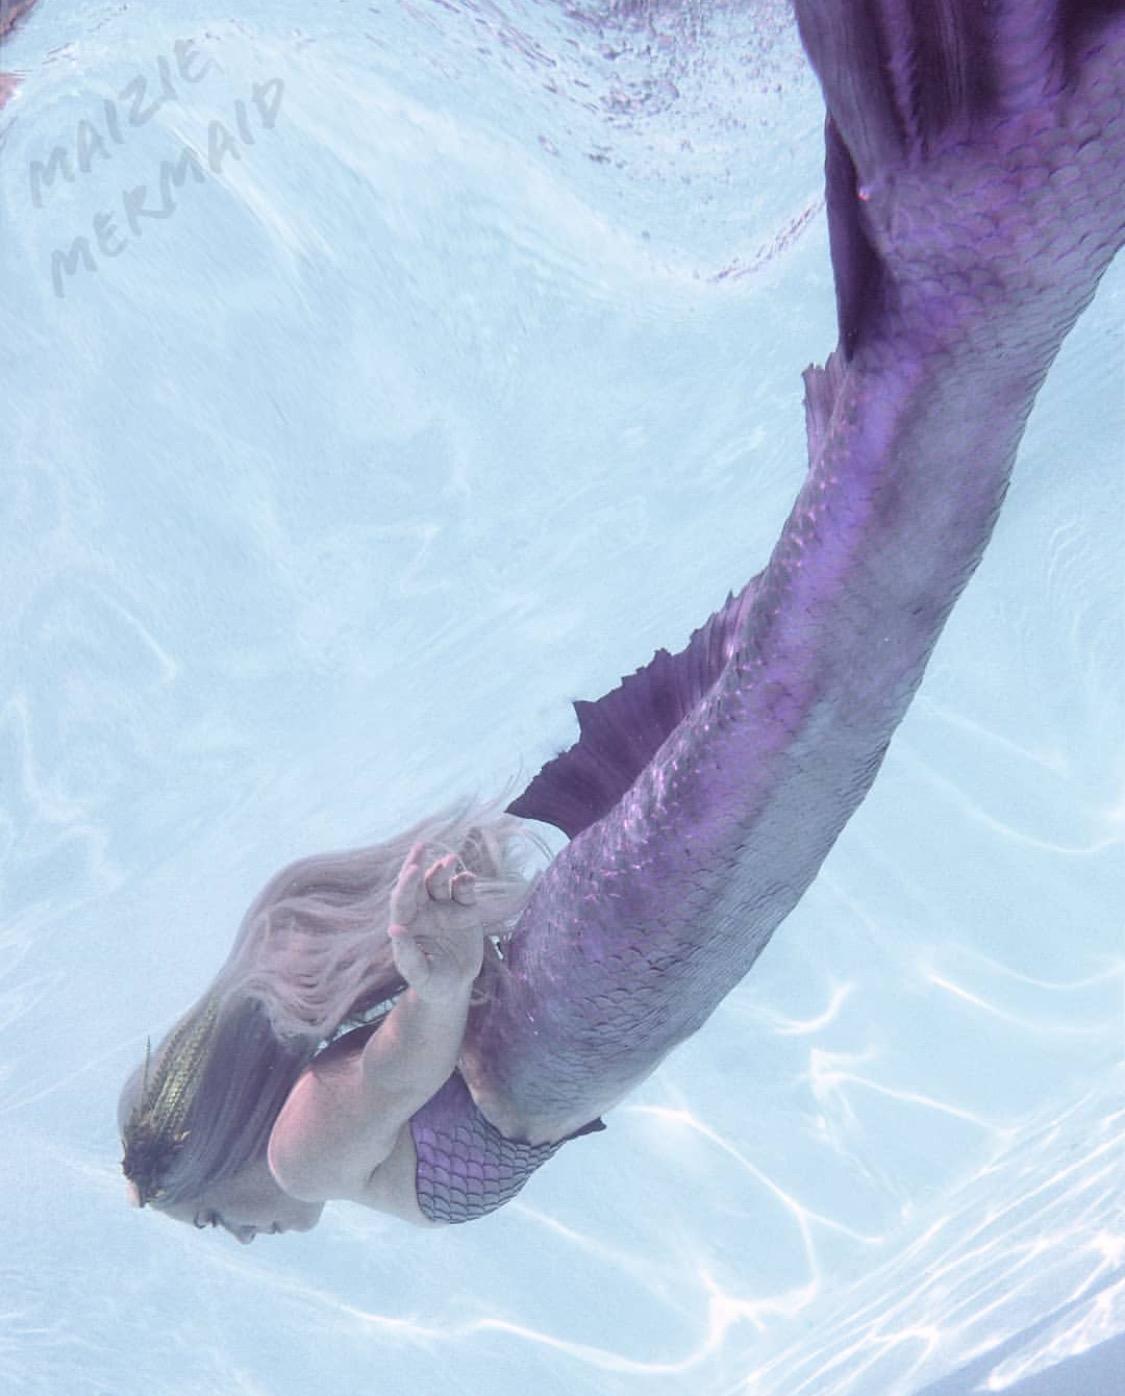 Maizie the Grand Canyon mermaid